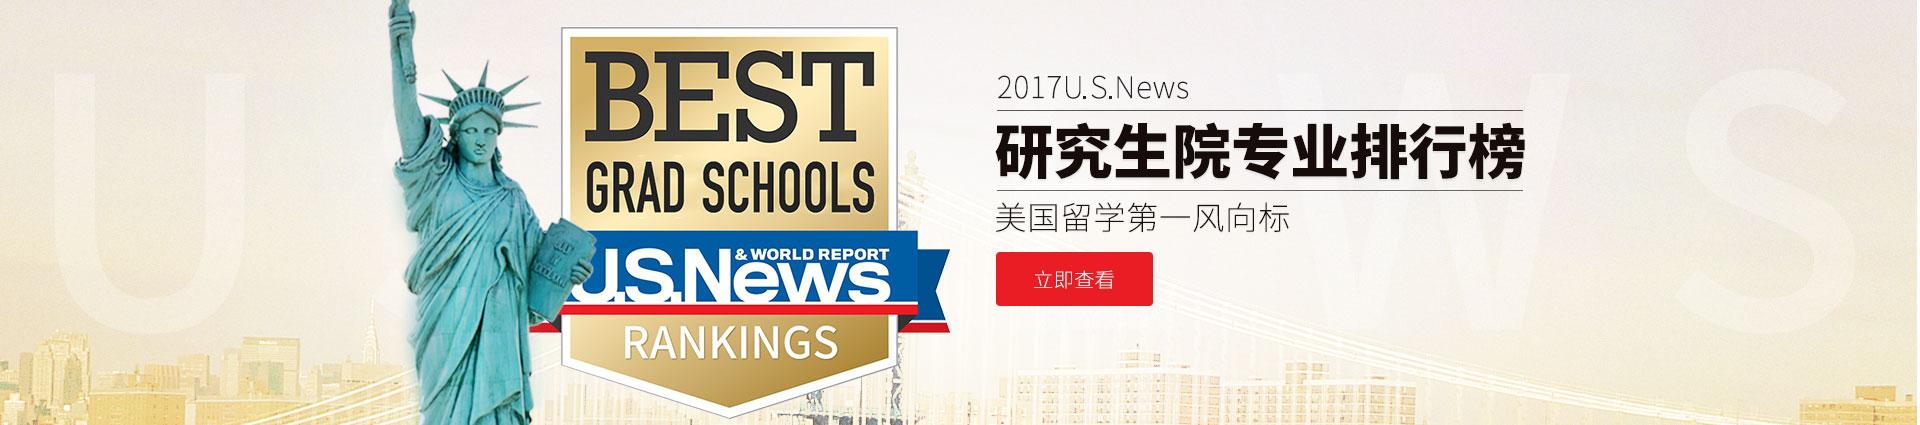 2017USNews美研专业排行榜